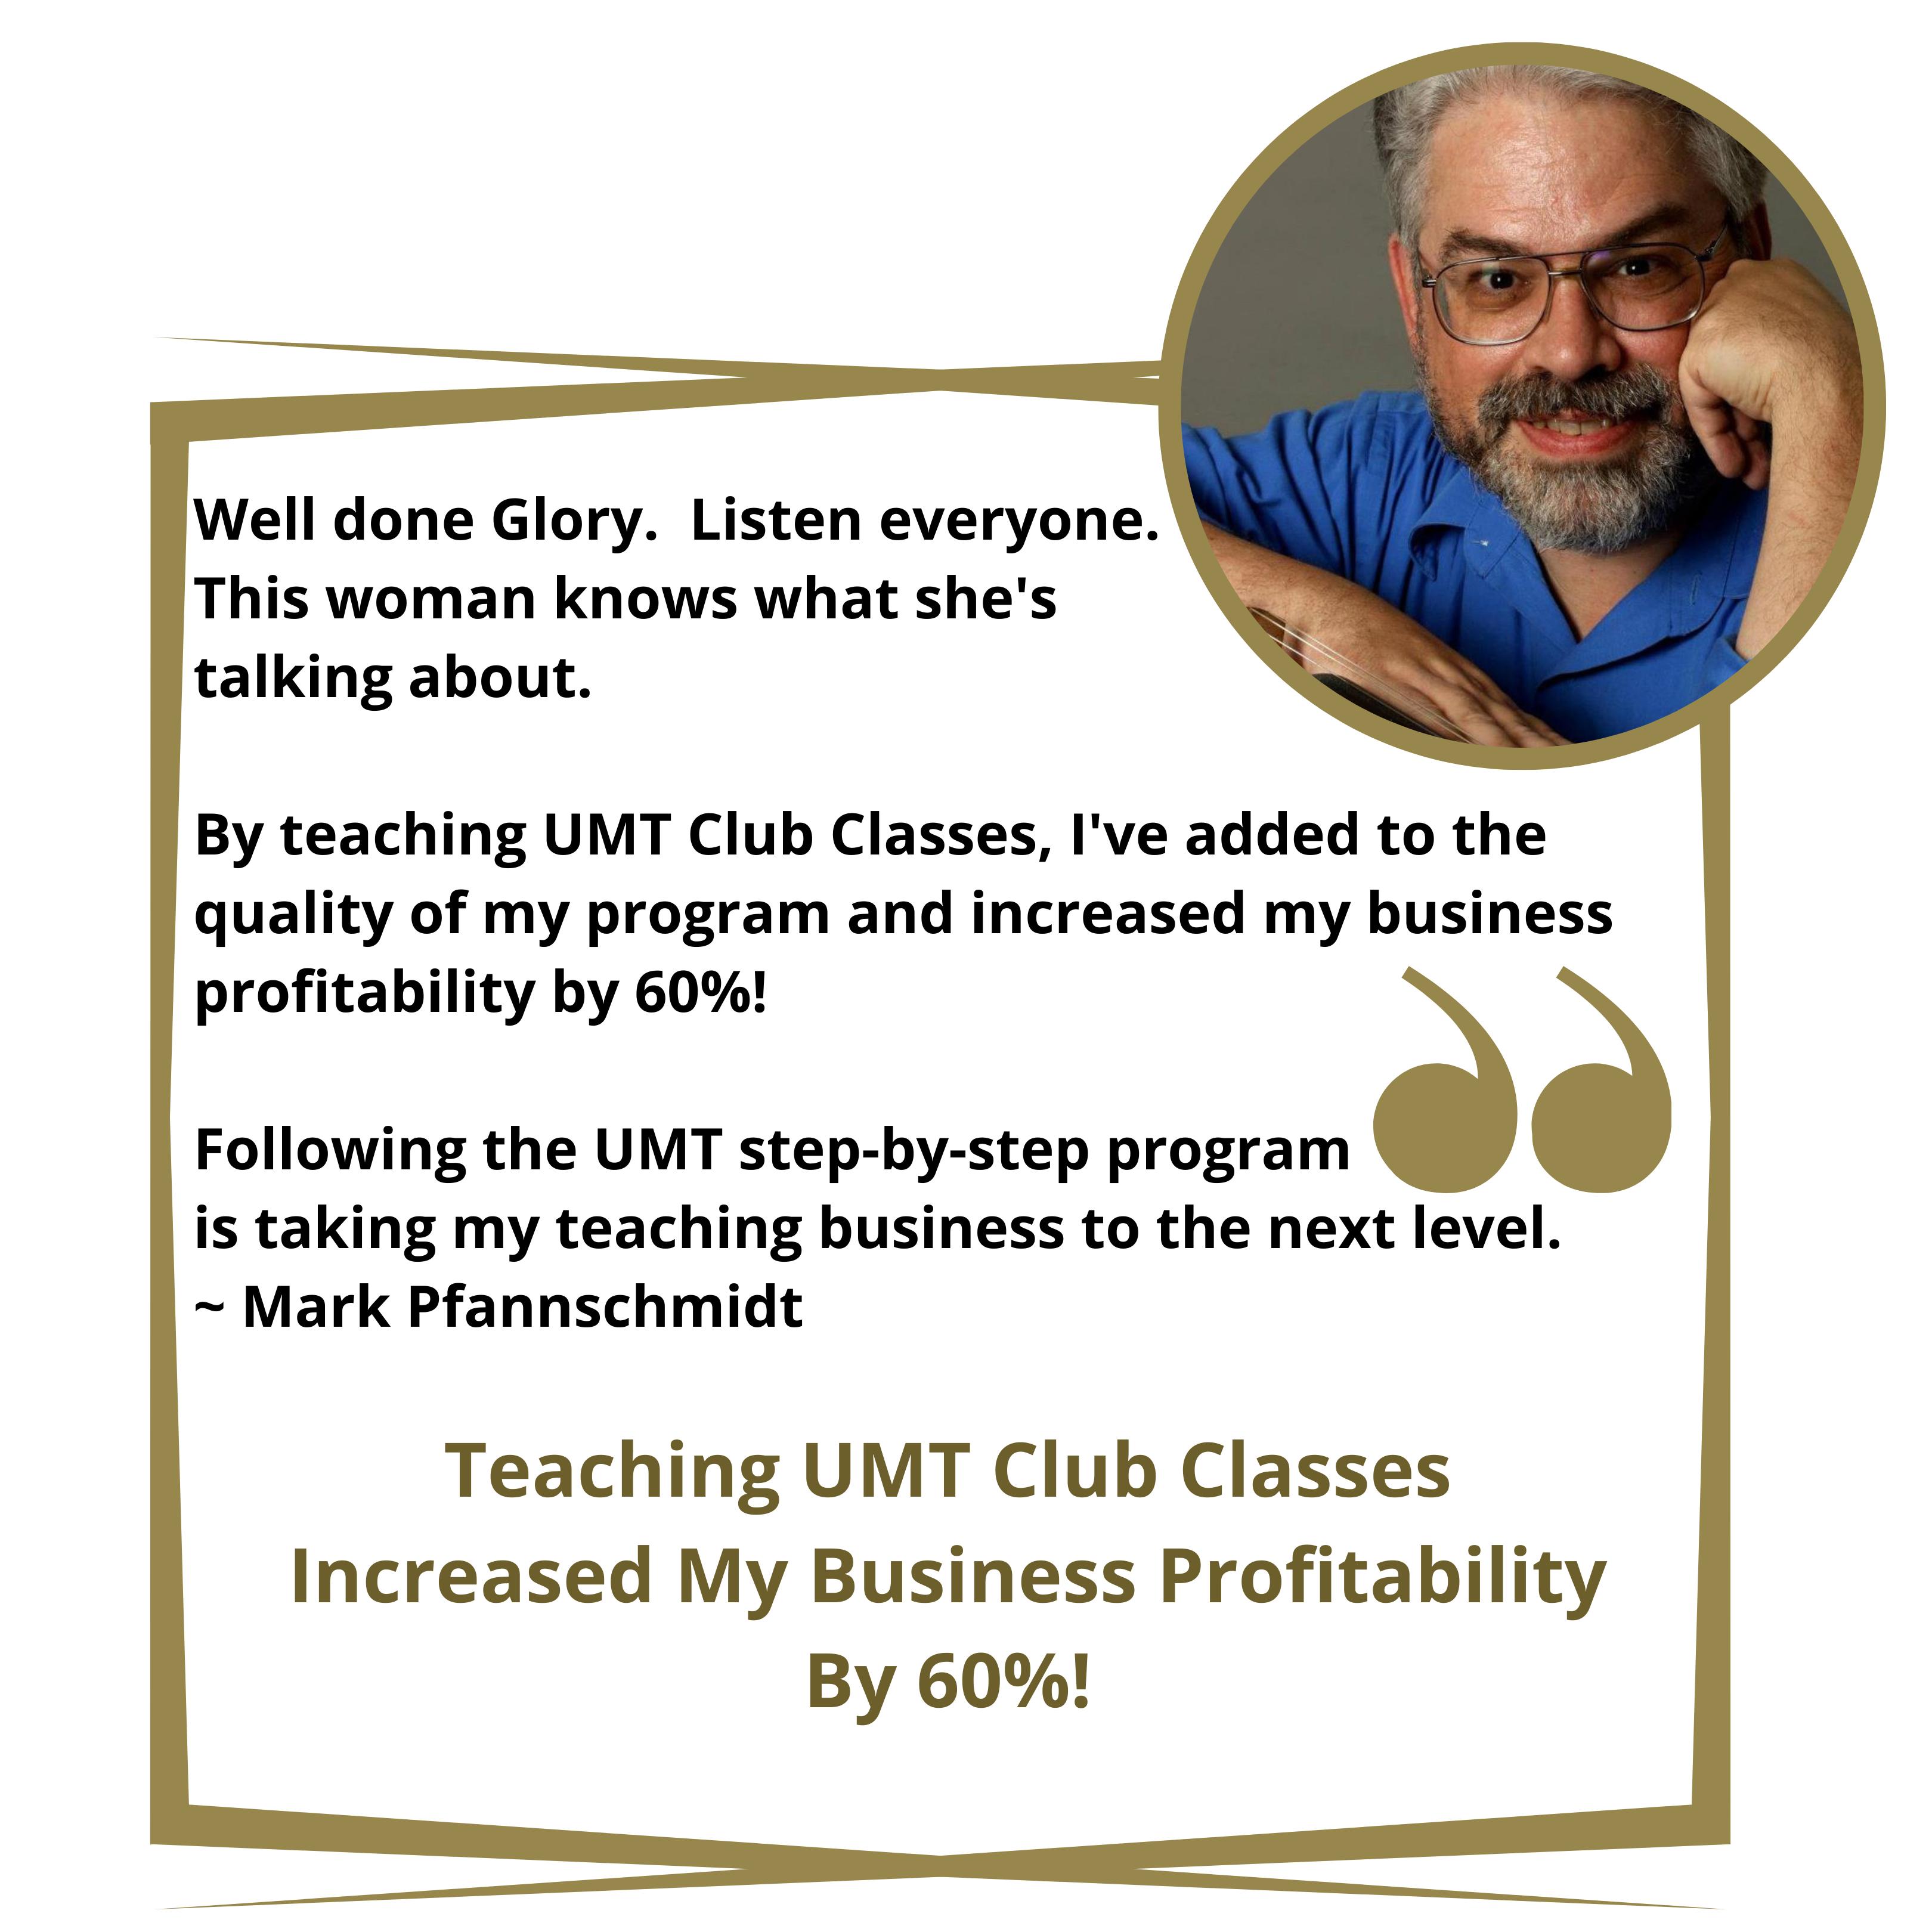 1 Mark Pfannschmidt UMTC ELITE EDUCATOR testimonial